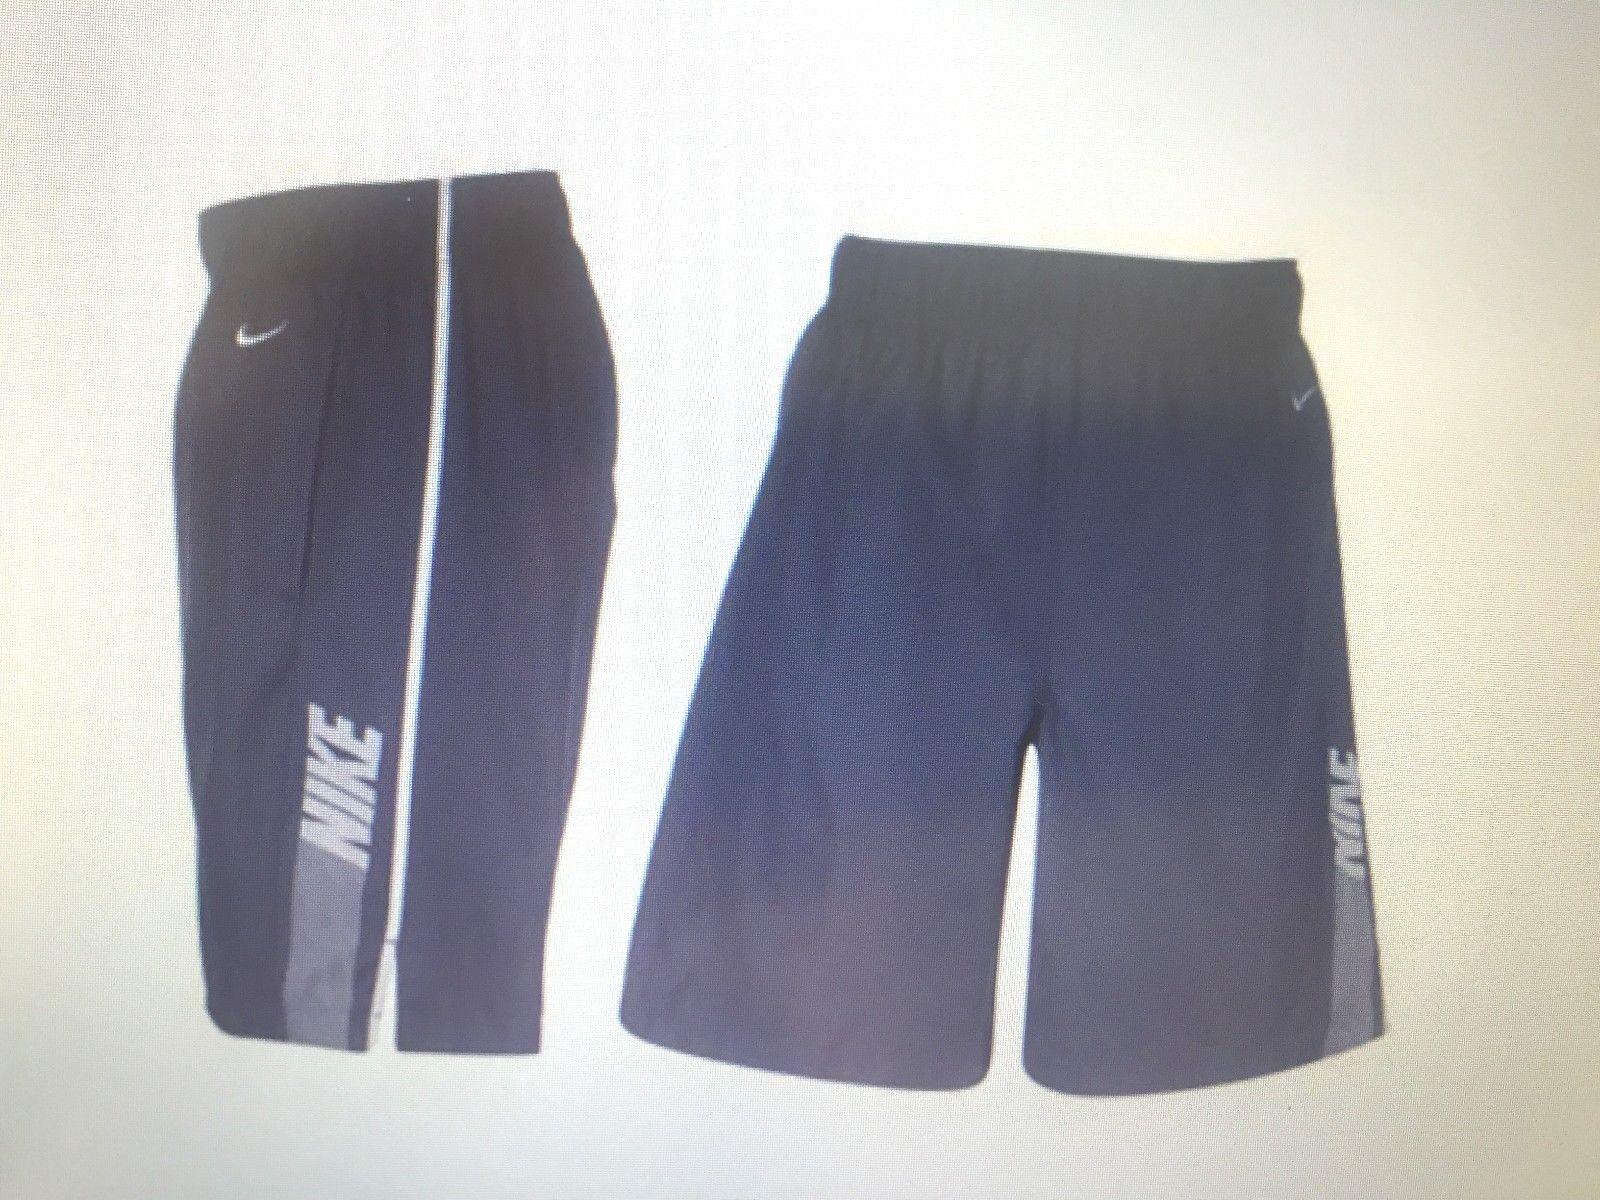 Nike Shorts Short Badehose Herren L NEU Athletic Active Bermuda 3/4 Badeshort